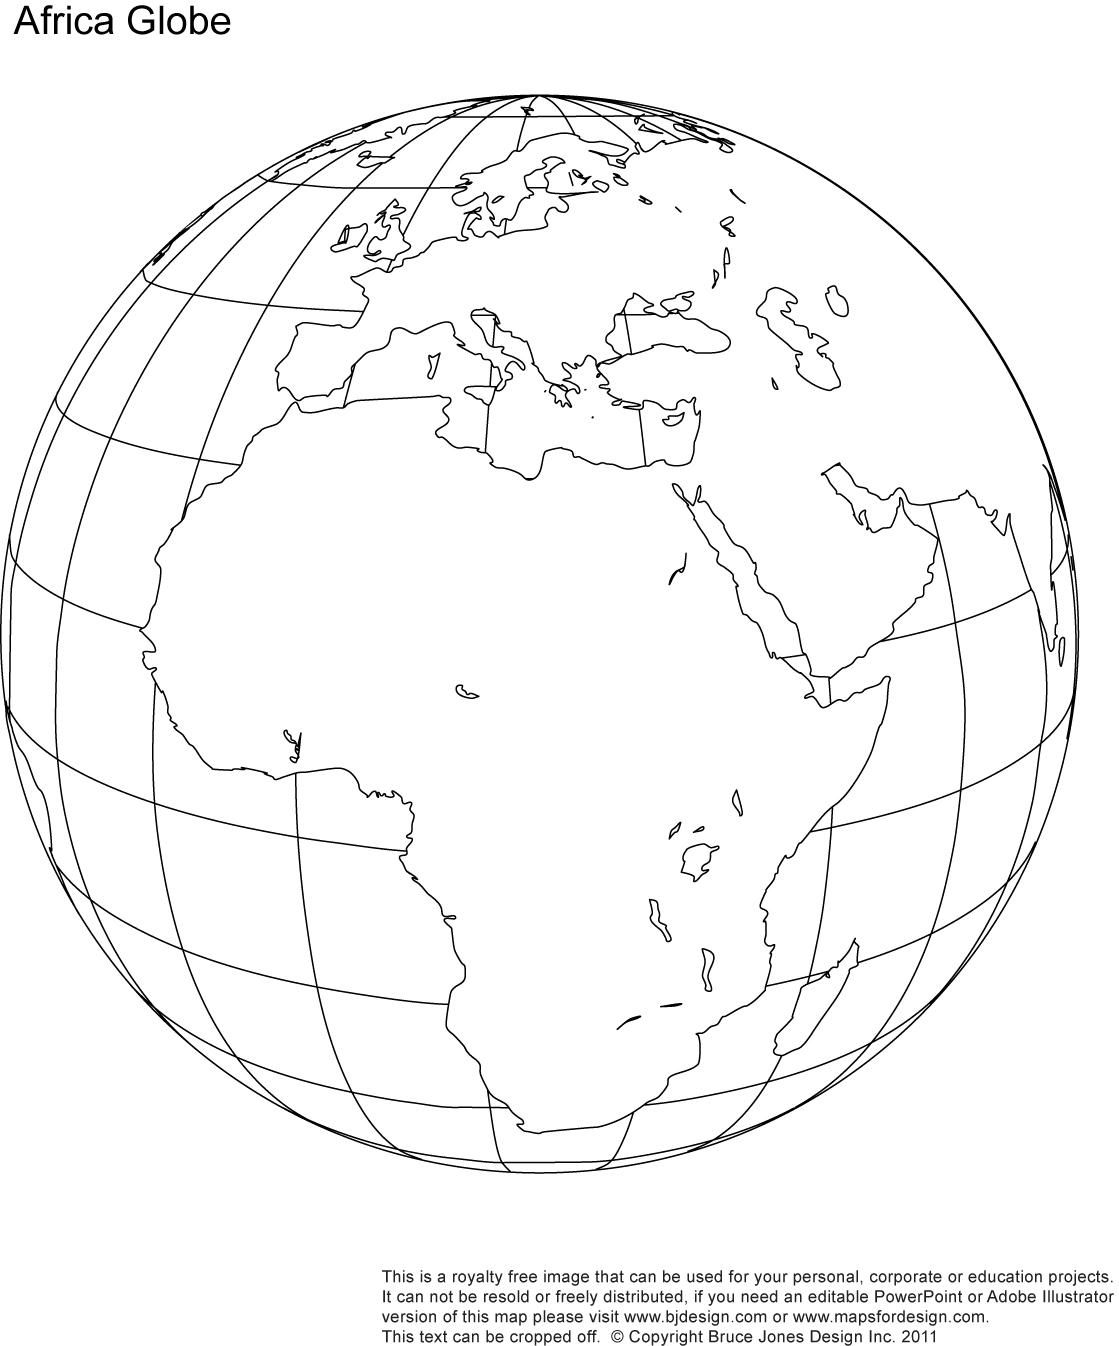 World globe map clipart graphic free Printable, Blank, World Globe Earth Maps • Royalty Free, jpg graphic free